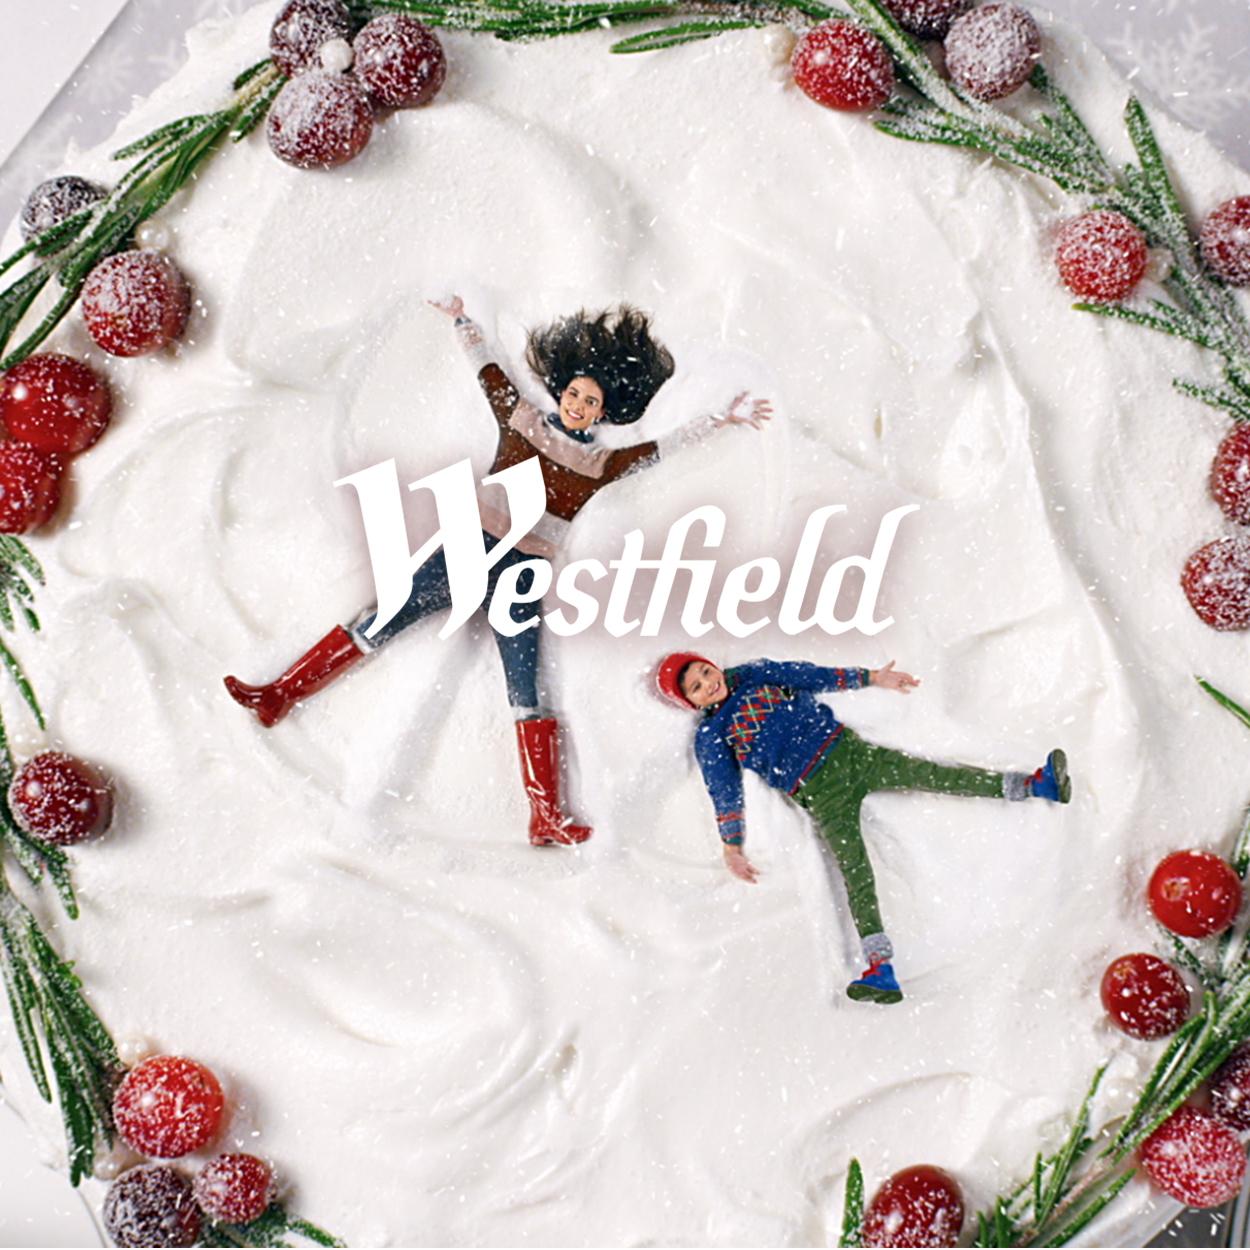 westfield_footer_600px.jpg